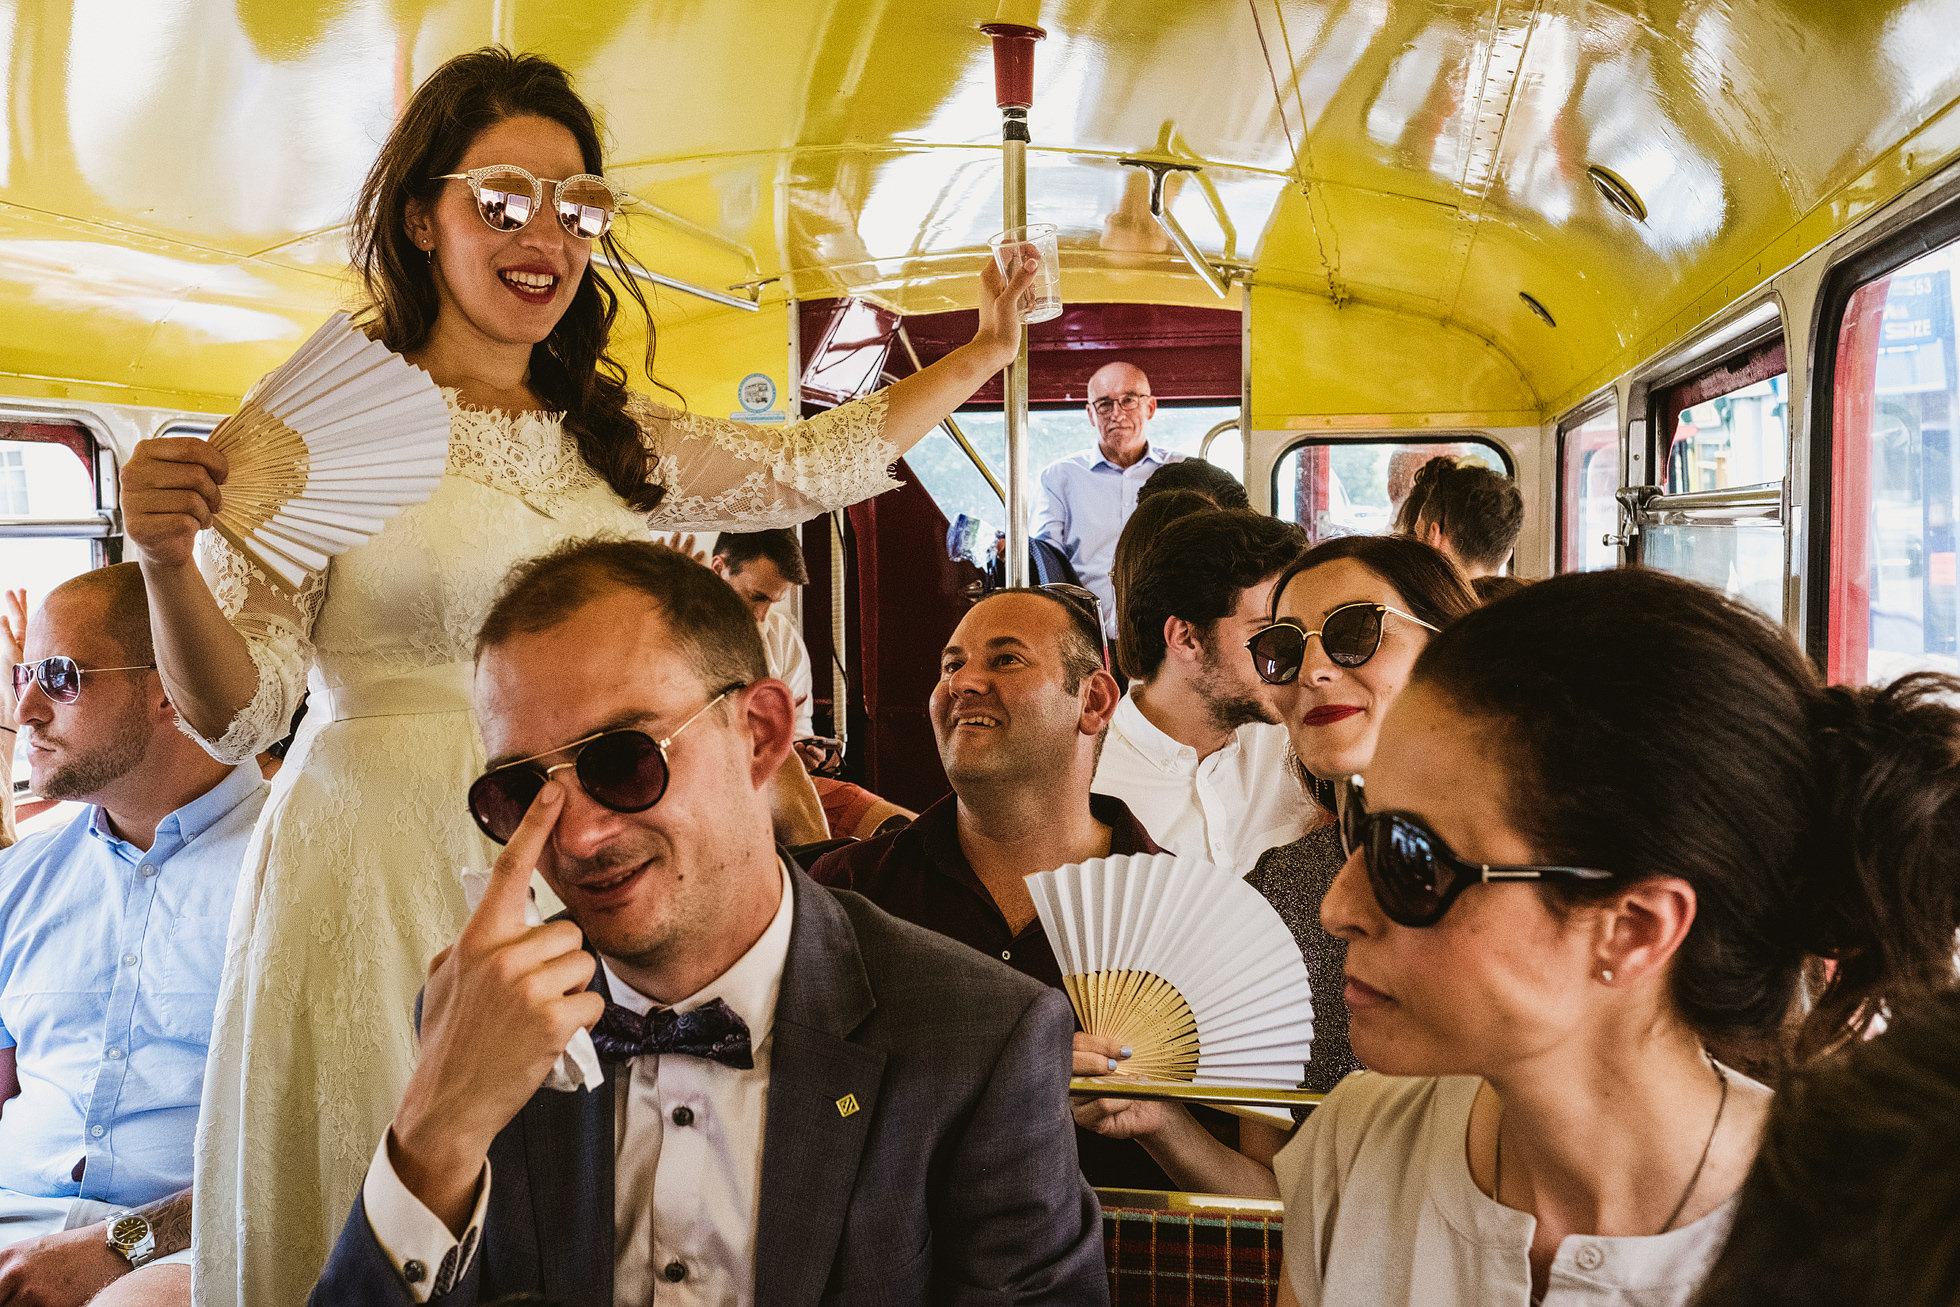 Bride and groom on bus wedding photograph